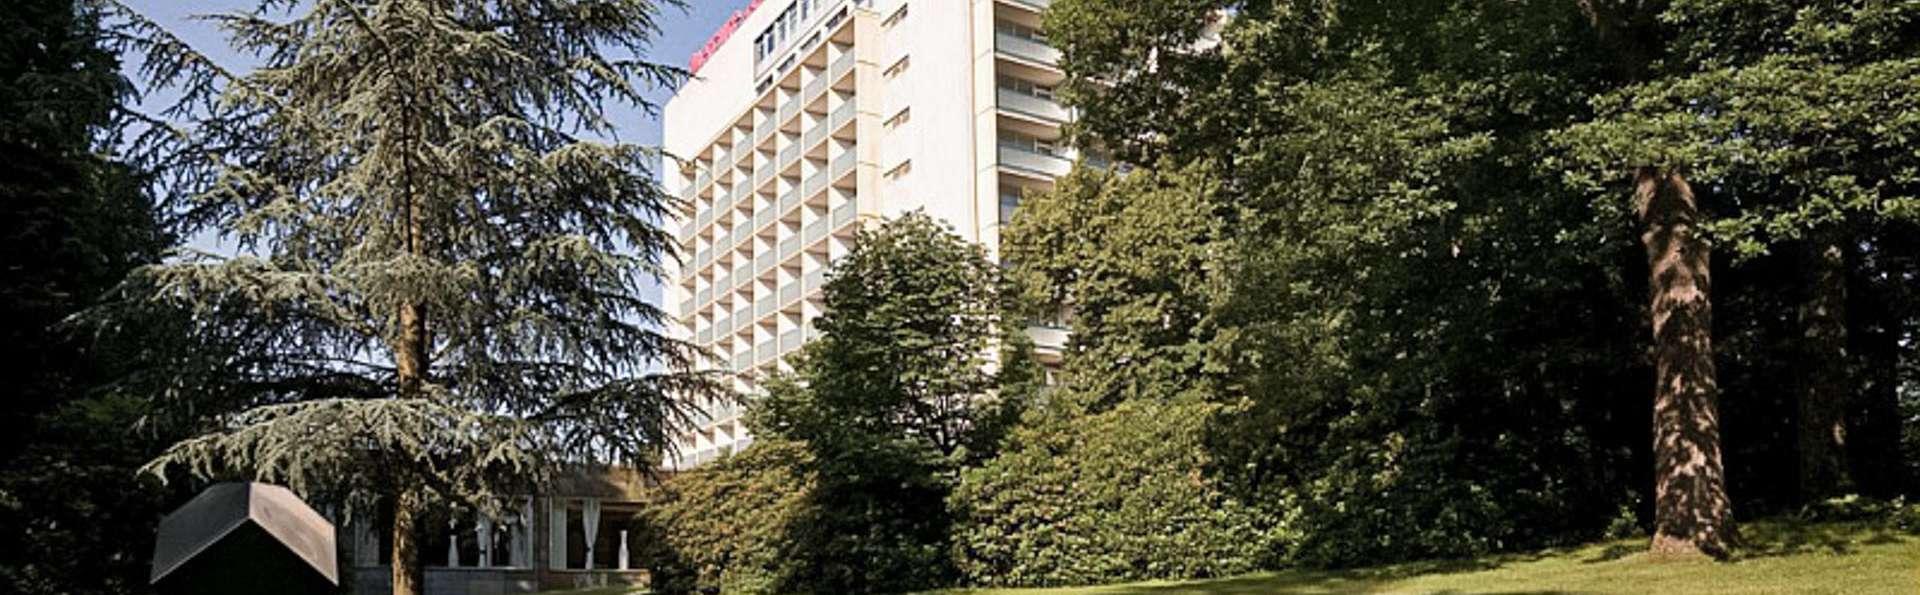 Mercure Hotel Lüdenscheid - EDIT_FRONT_02.jpg